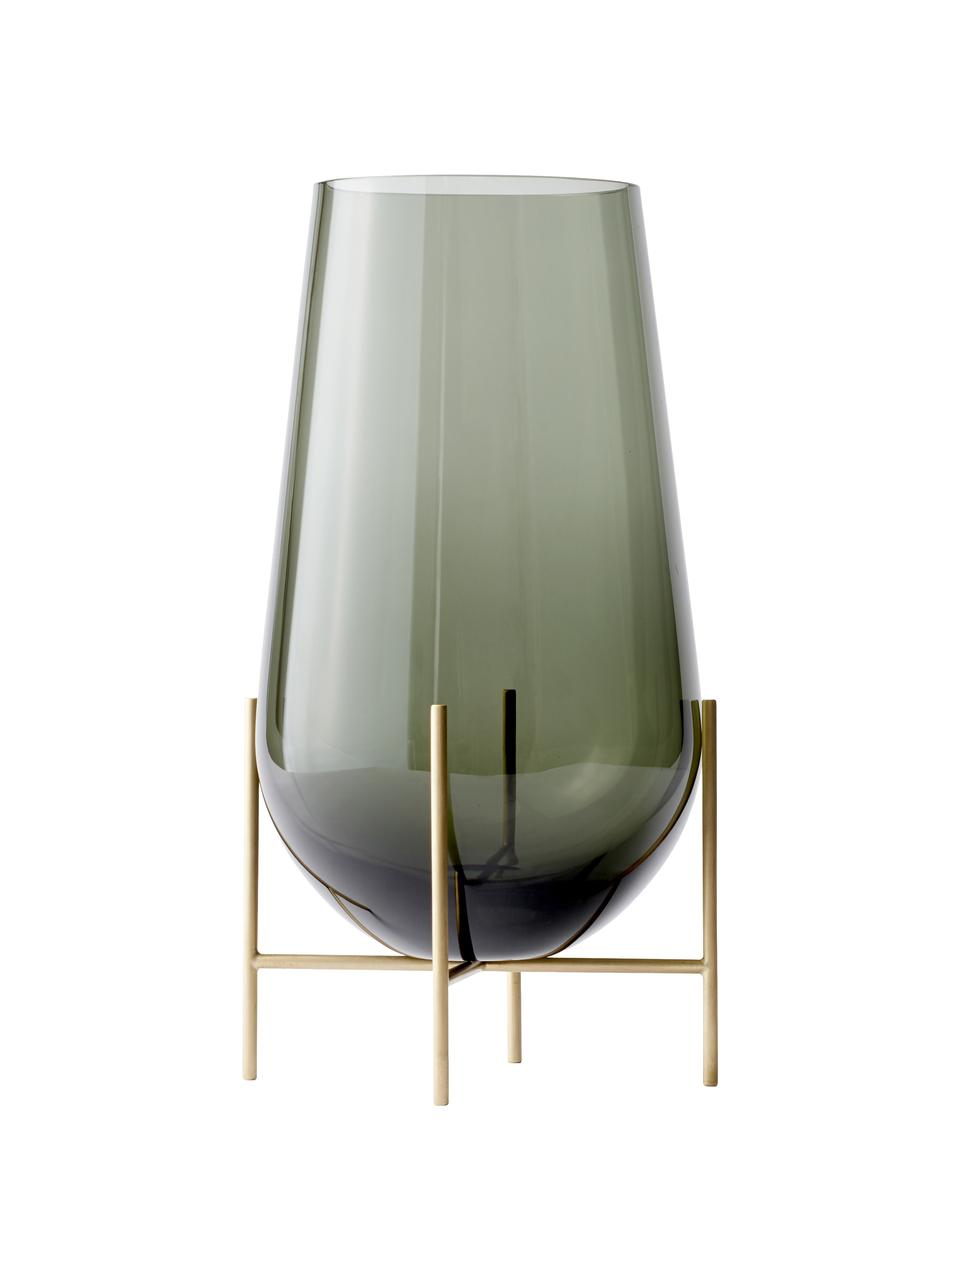 Mundgeblasene Bodenvase Échasse, Gestell: Messing, Vase: Glas, mundgeblasen, Messingfarben, Grau, Ø 30 x H 60 cm